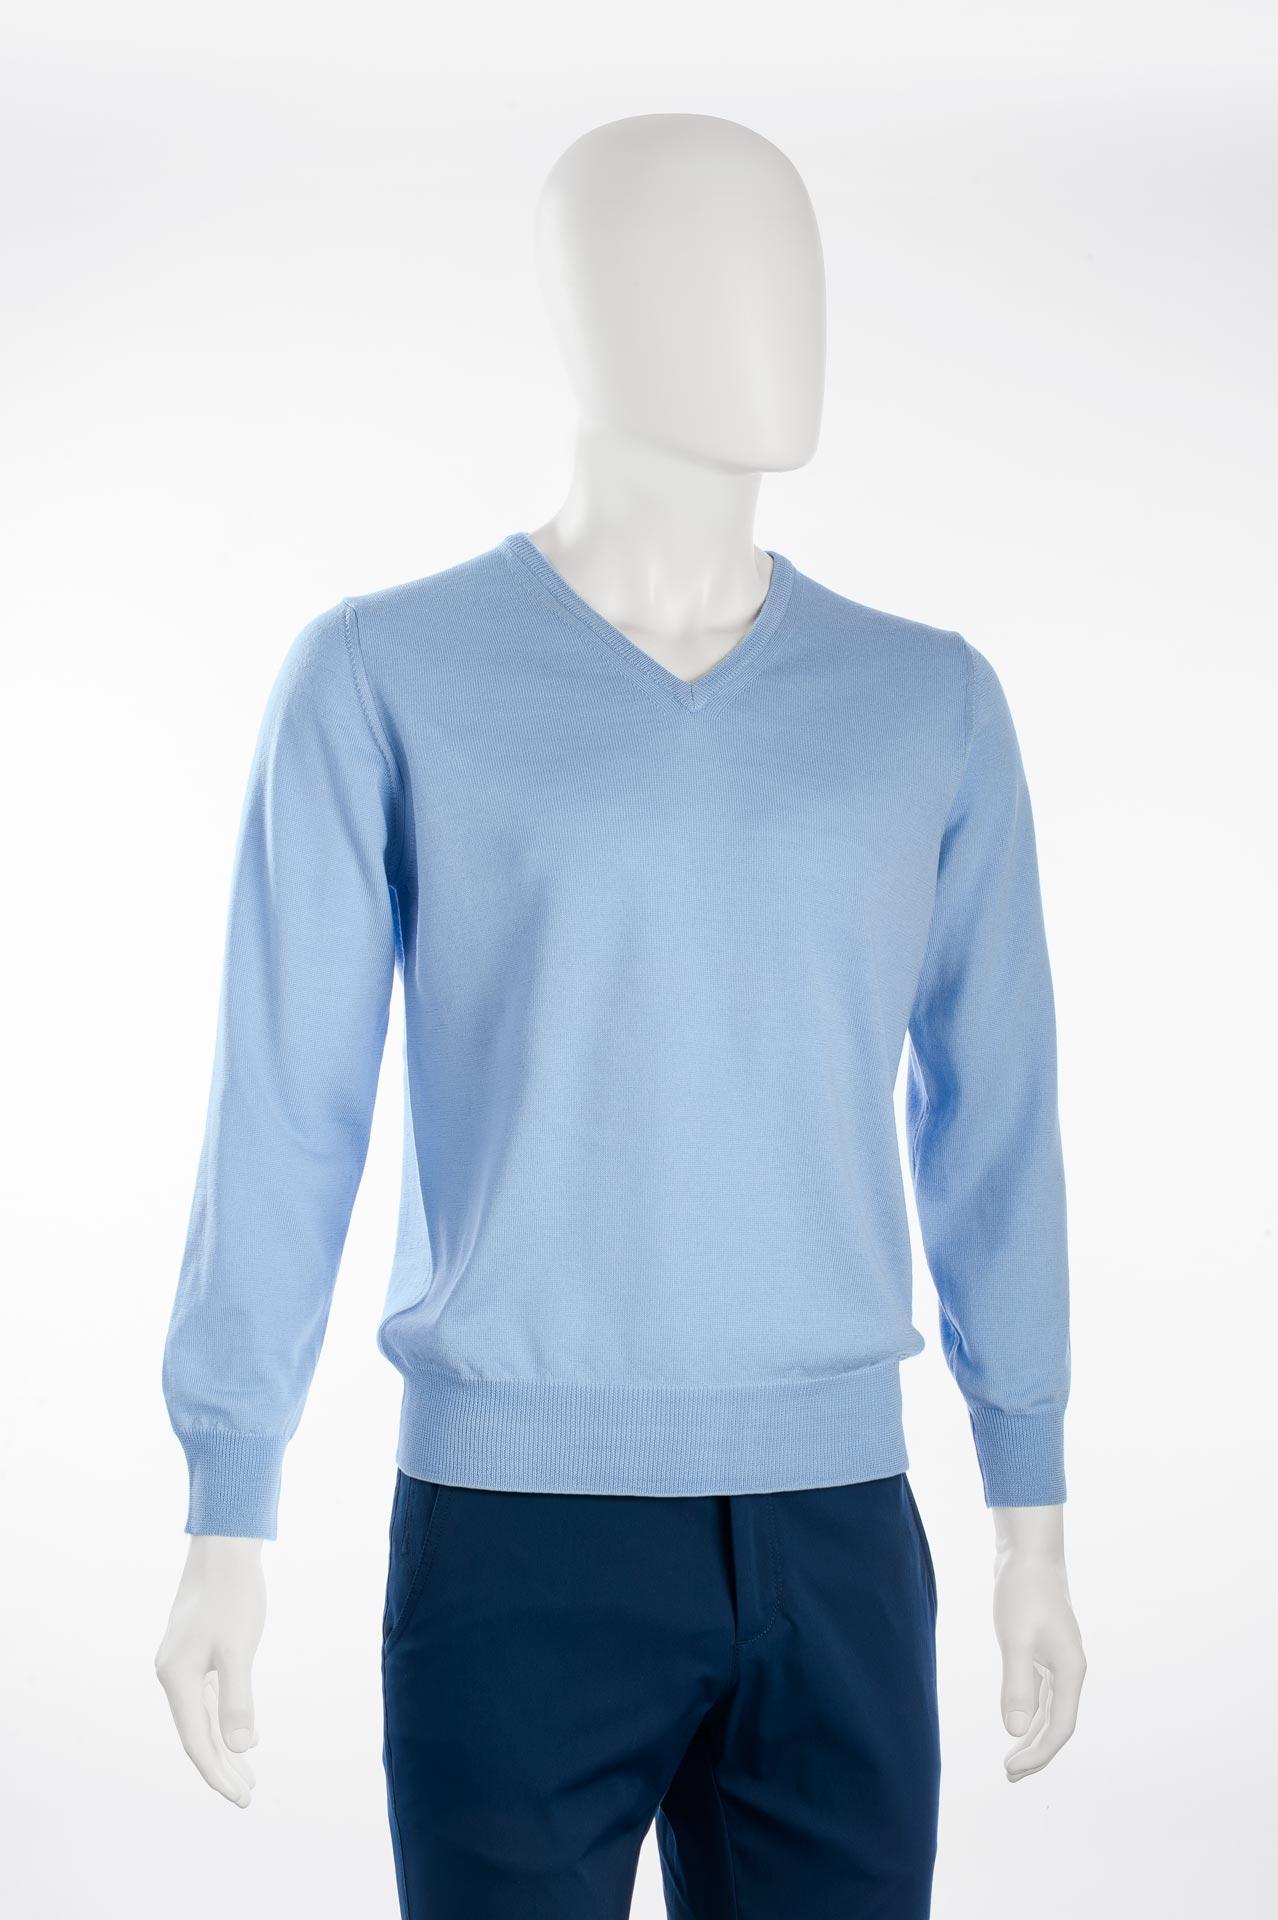 Pullover uomo manica lungaART.1500 colore 2260